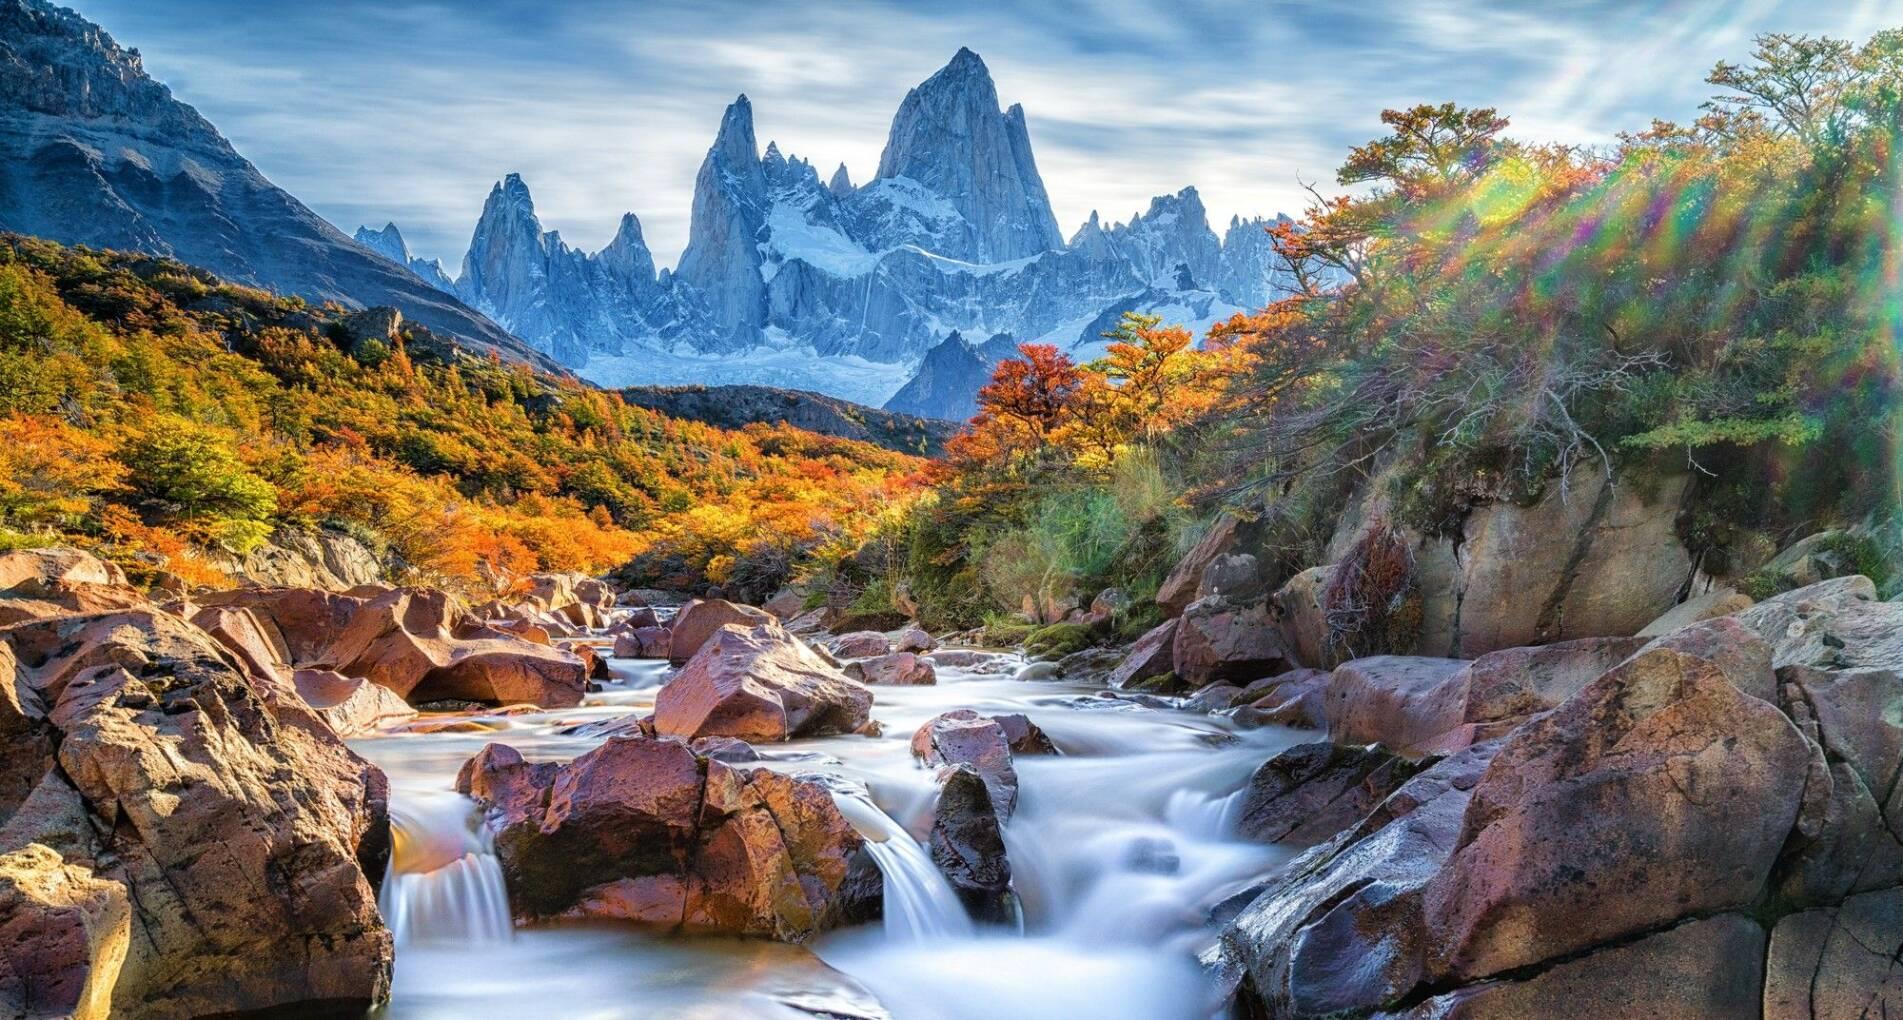 Argentinië en Chili: Buenos Aires, Patagonië en pampa's - Argentinië - 1